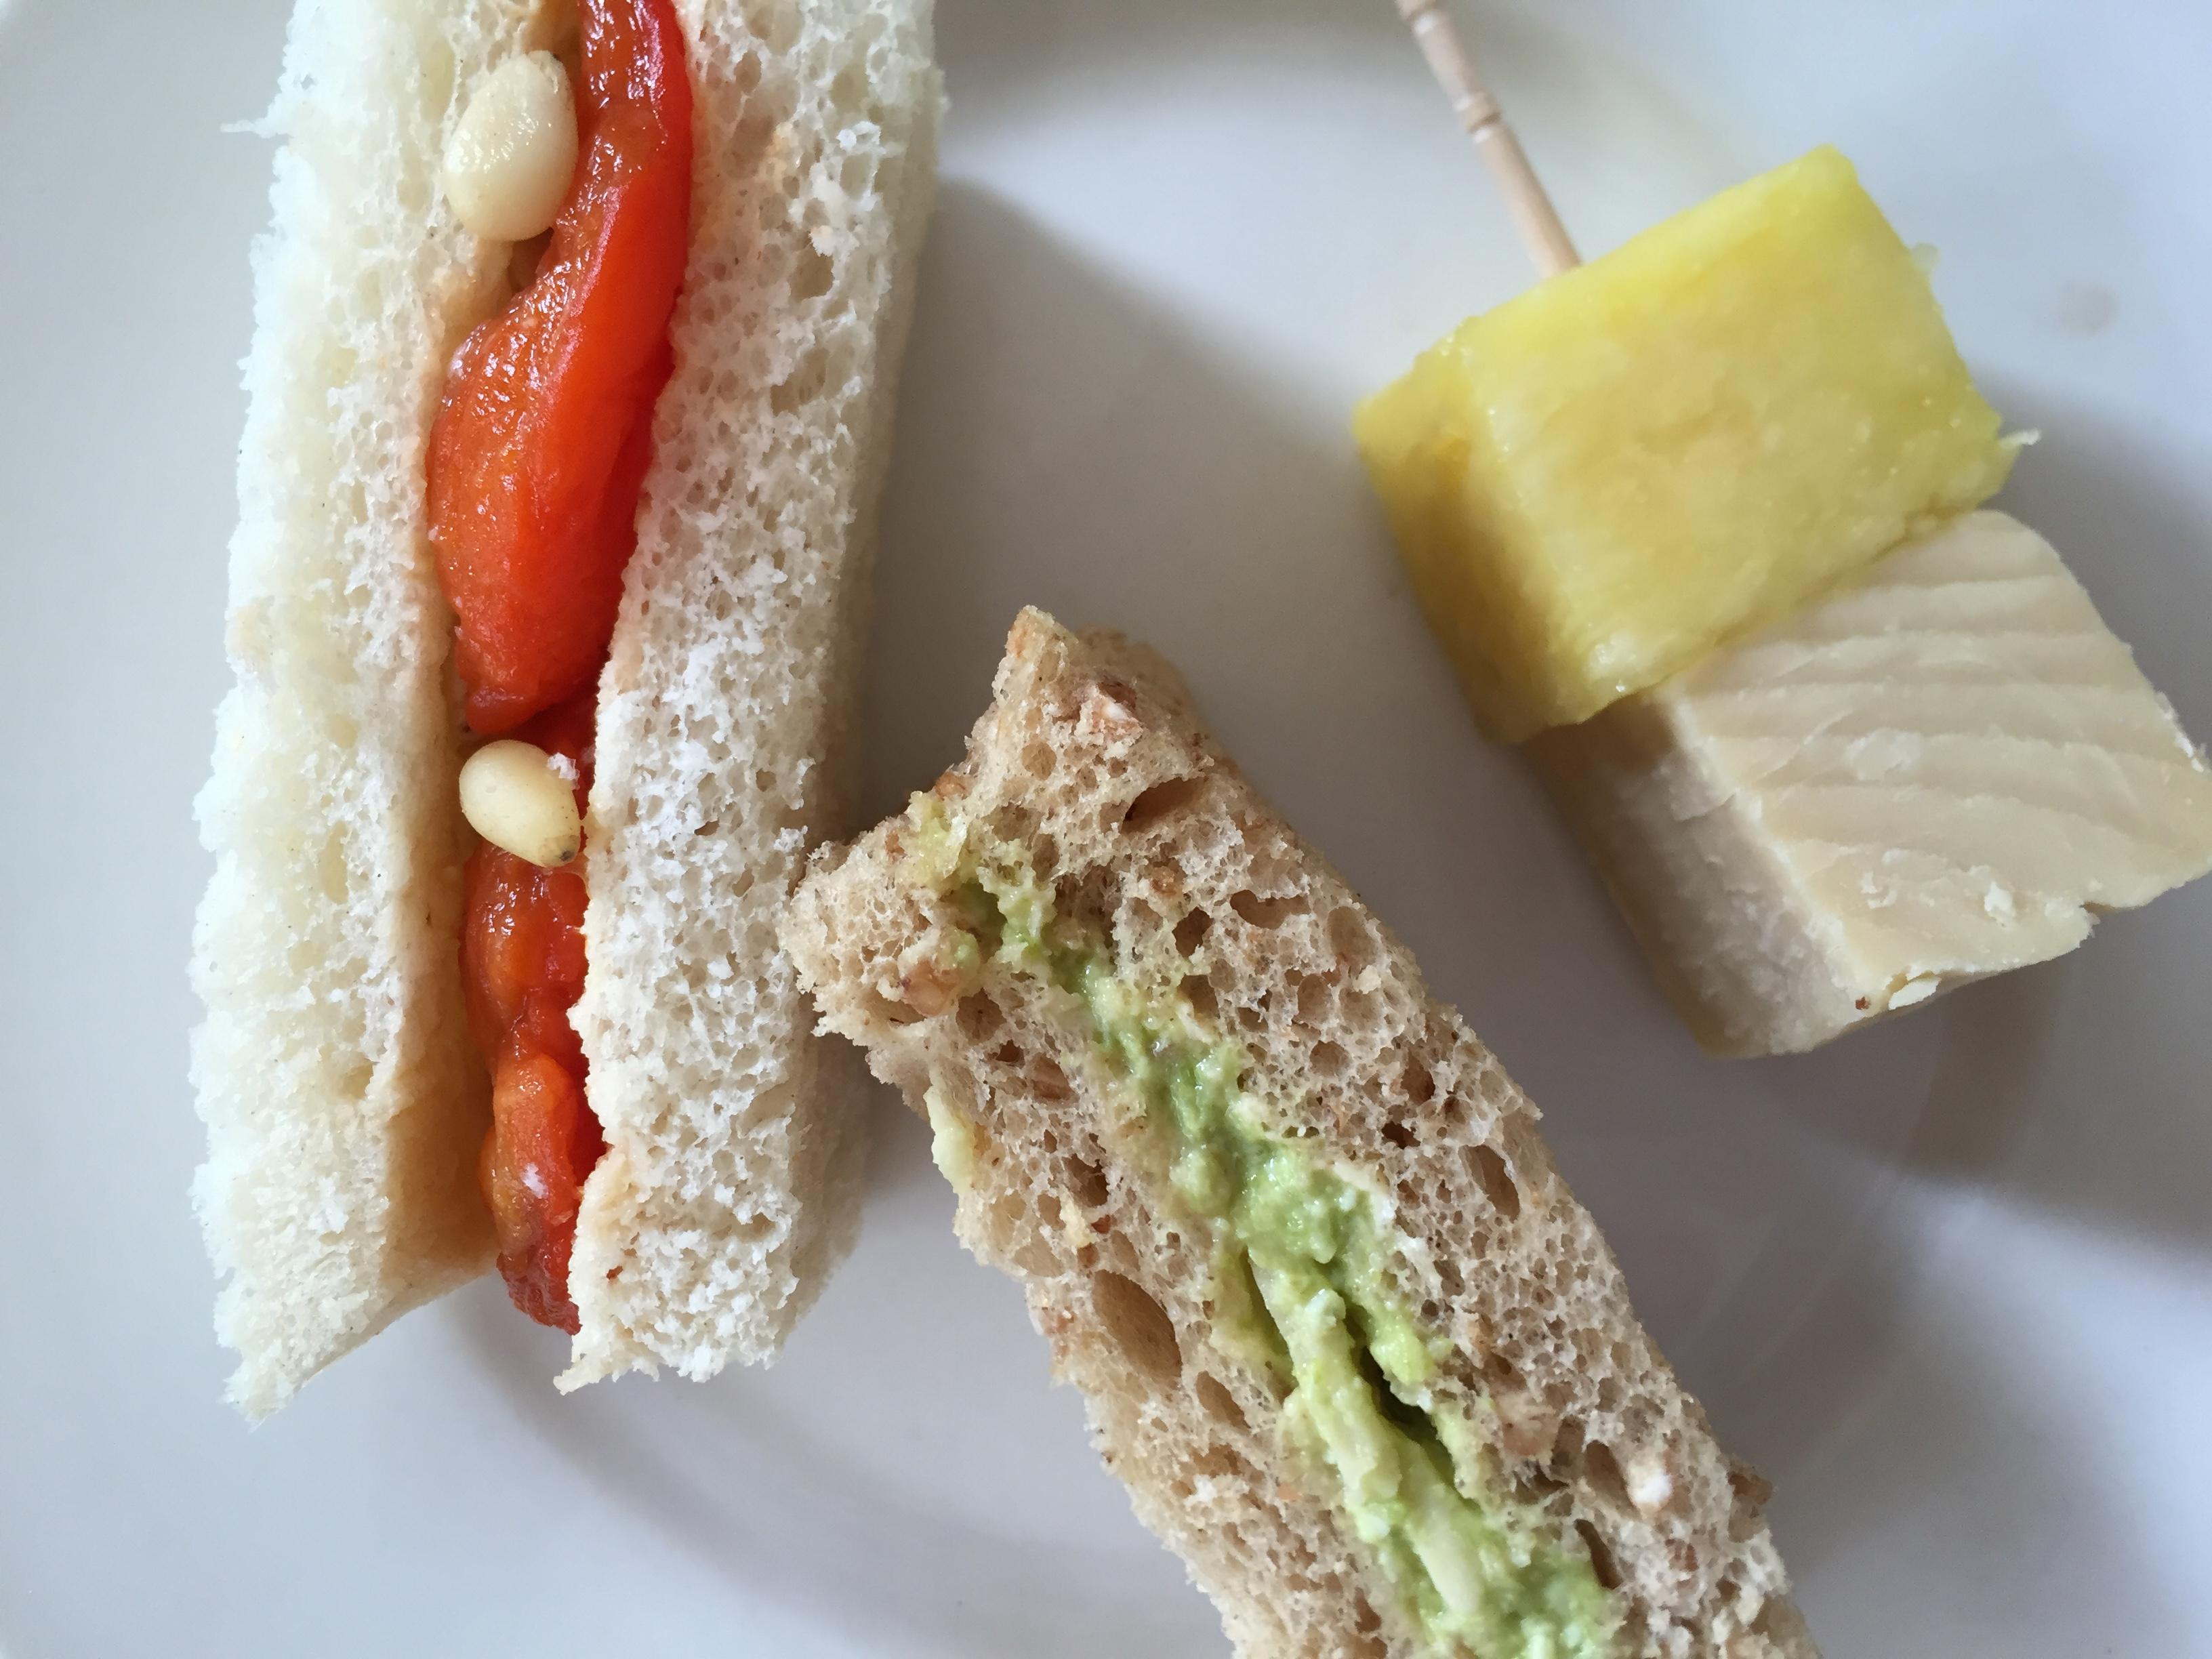 Vegan sandwiches at Compton Acres